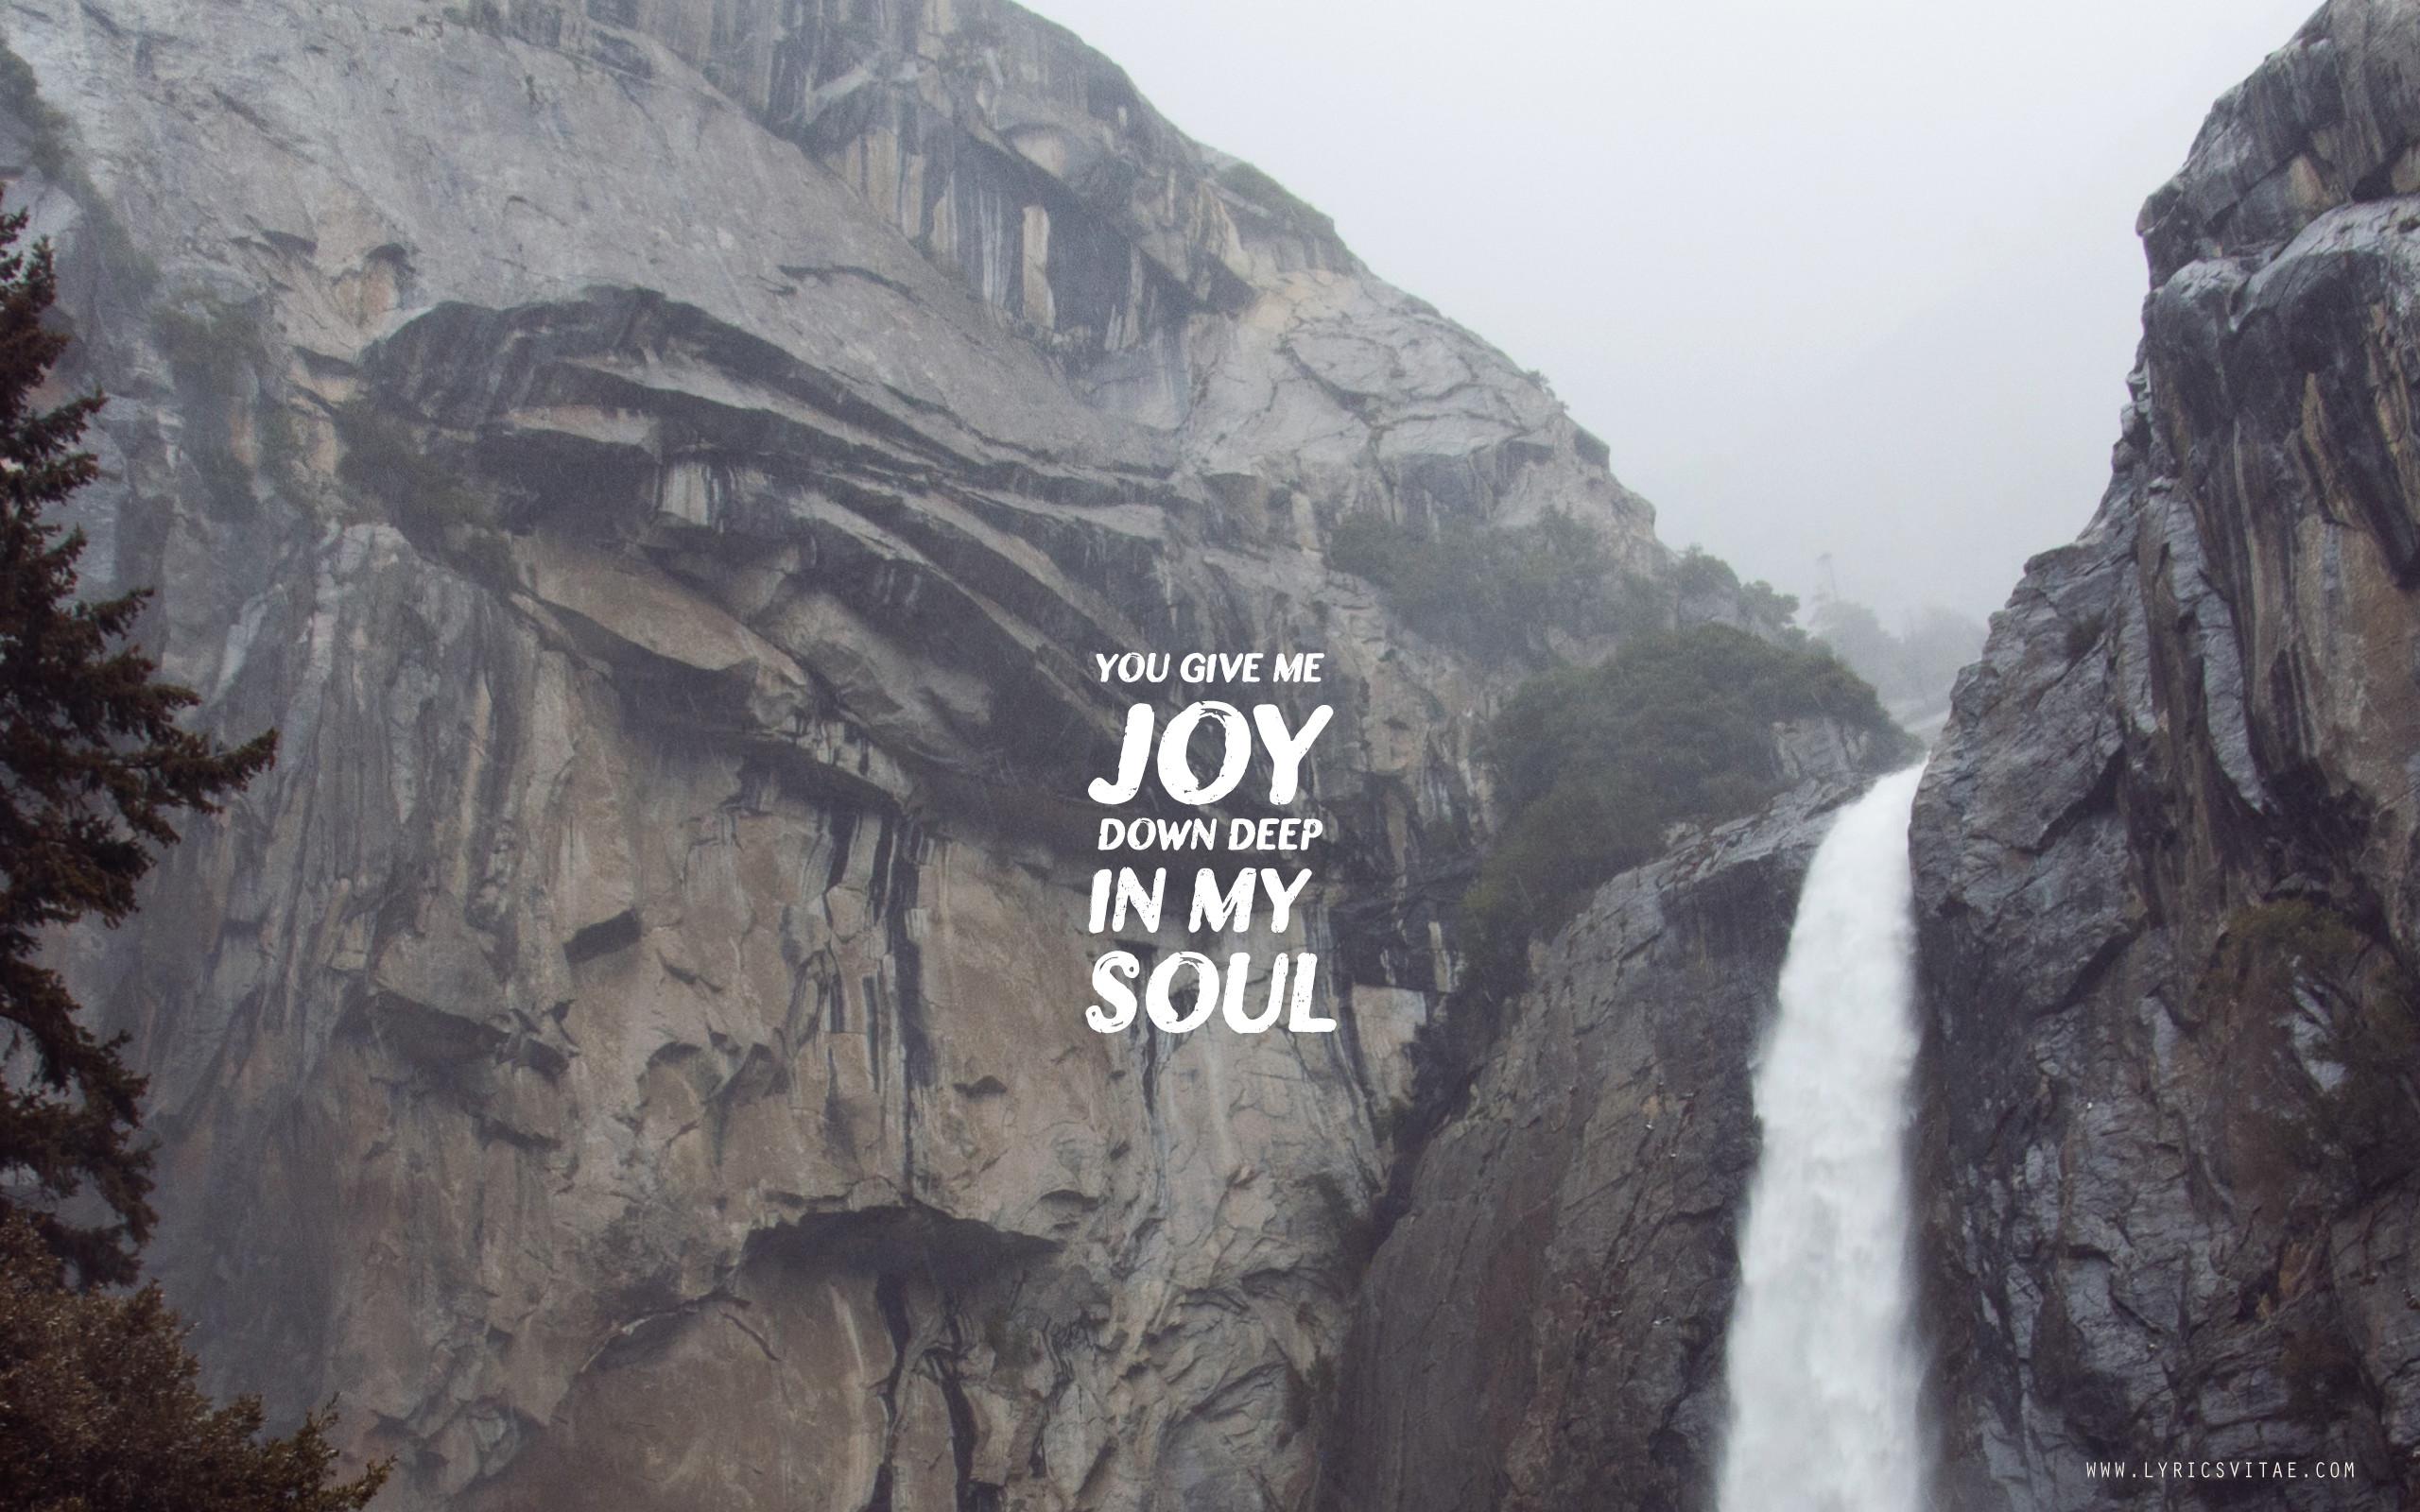 """Joy"" by Housefires // Laptop wallpaper format // Like us on Facebook"